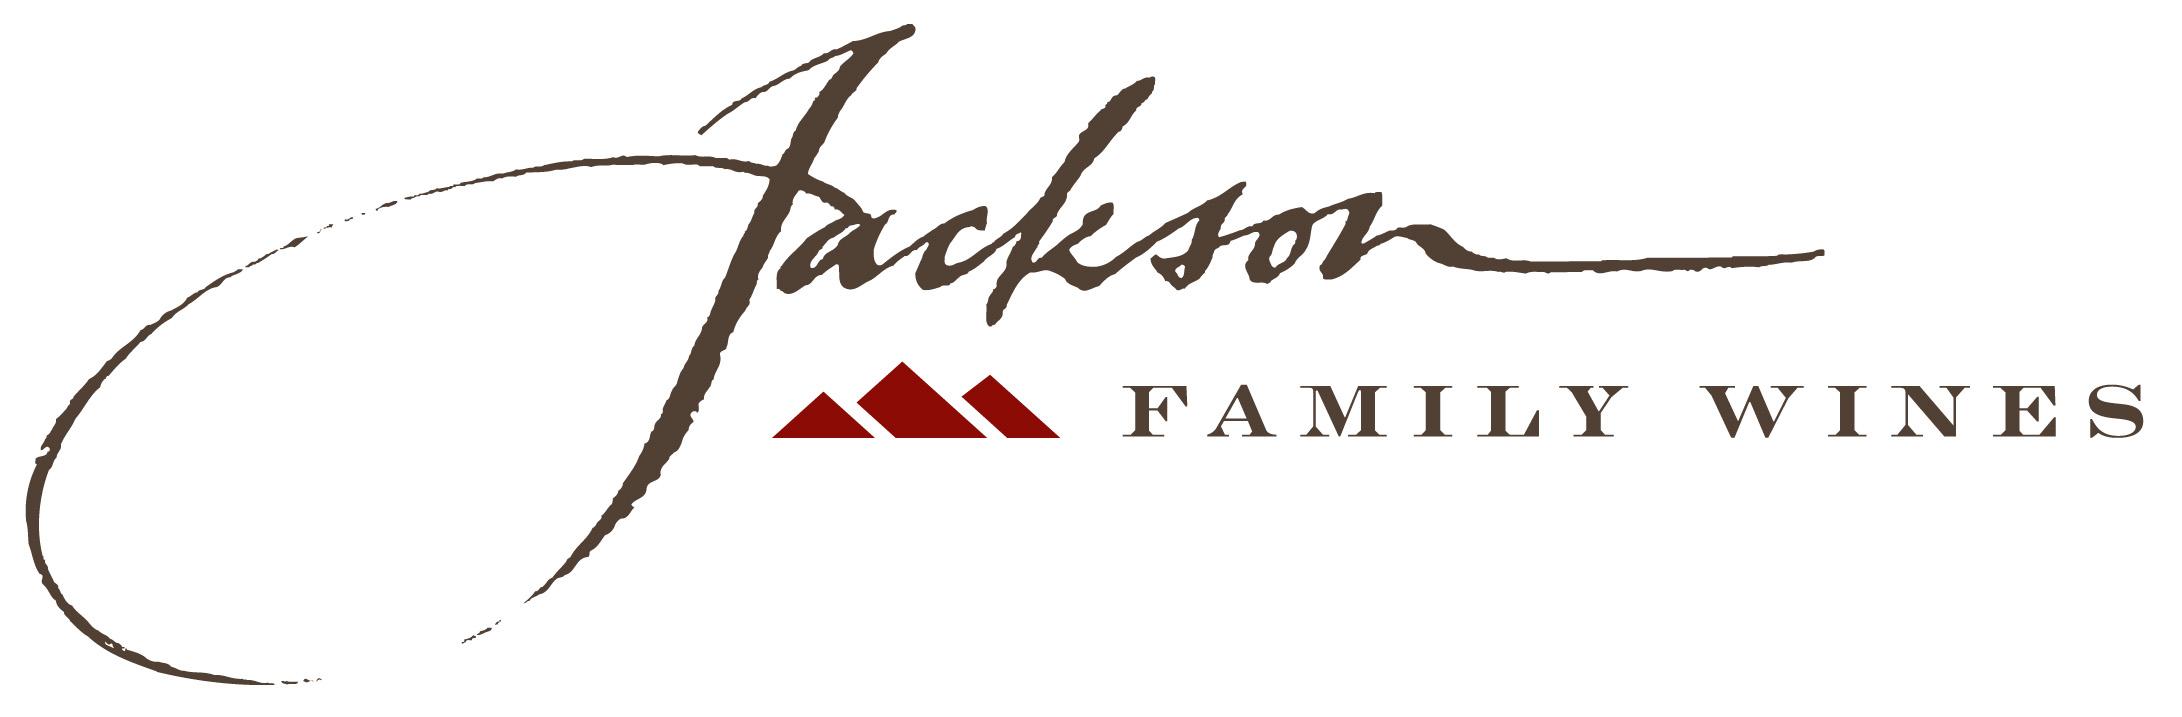 jacksonfamilywines